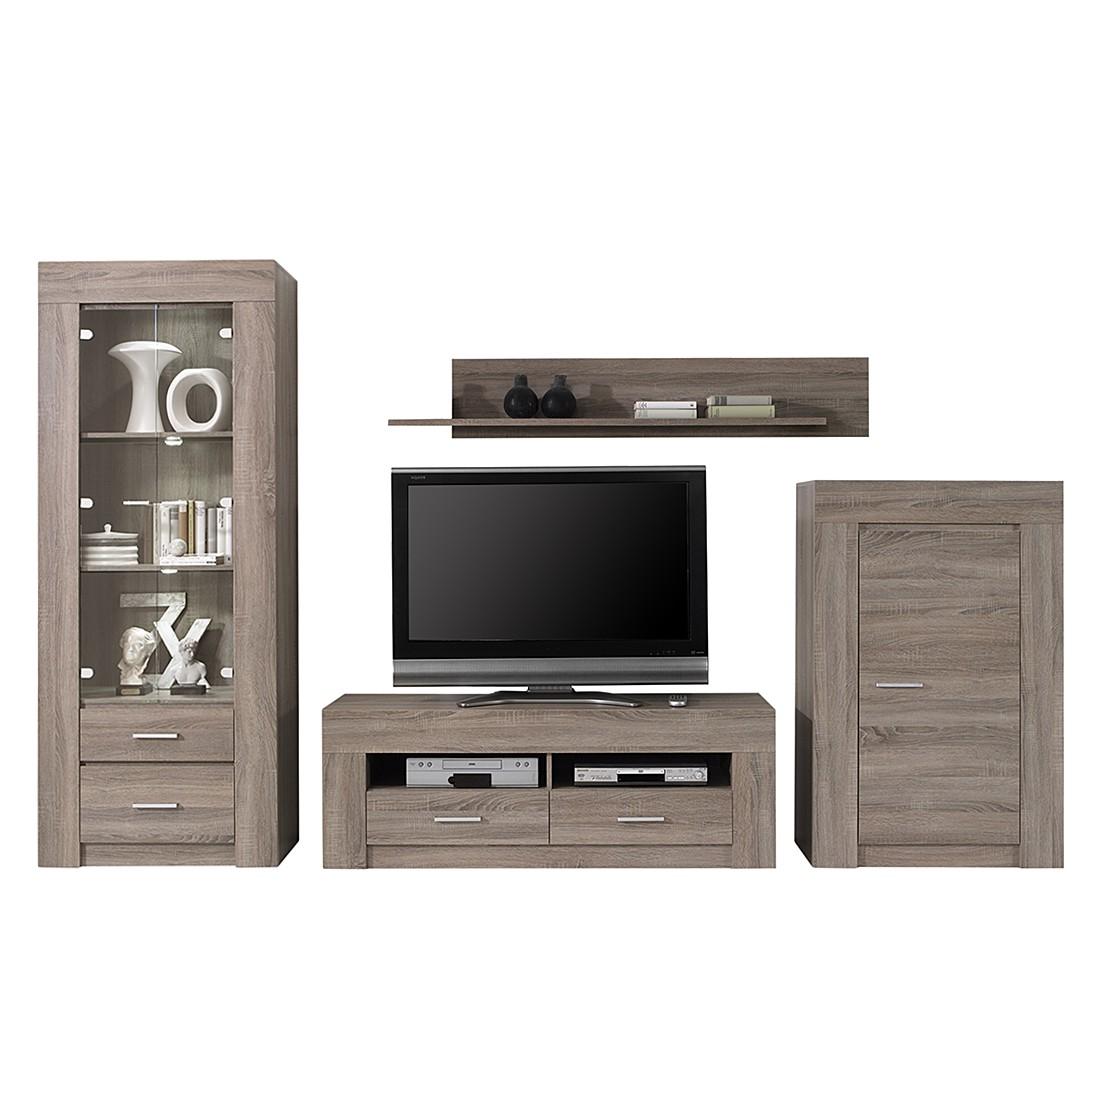 wohnwand impresa i 4 teilig sonoma eiche dekor ohne beleuchtung. Black Bedroom Furniture Sets. Home Design Ideas